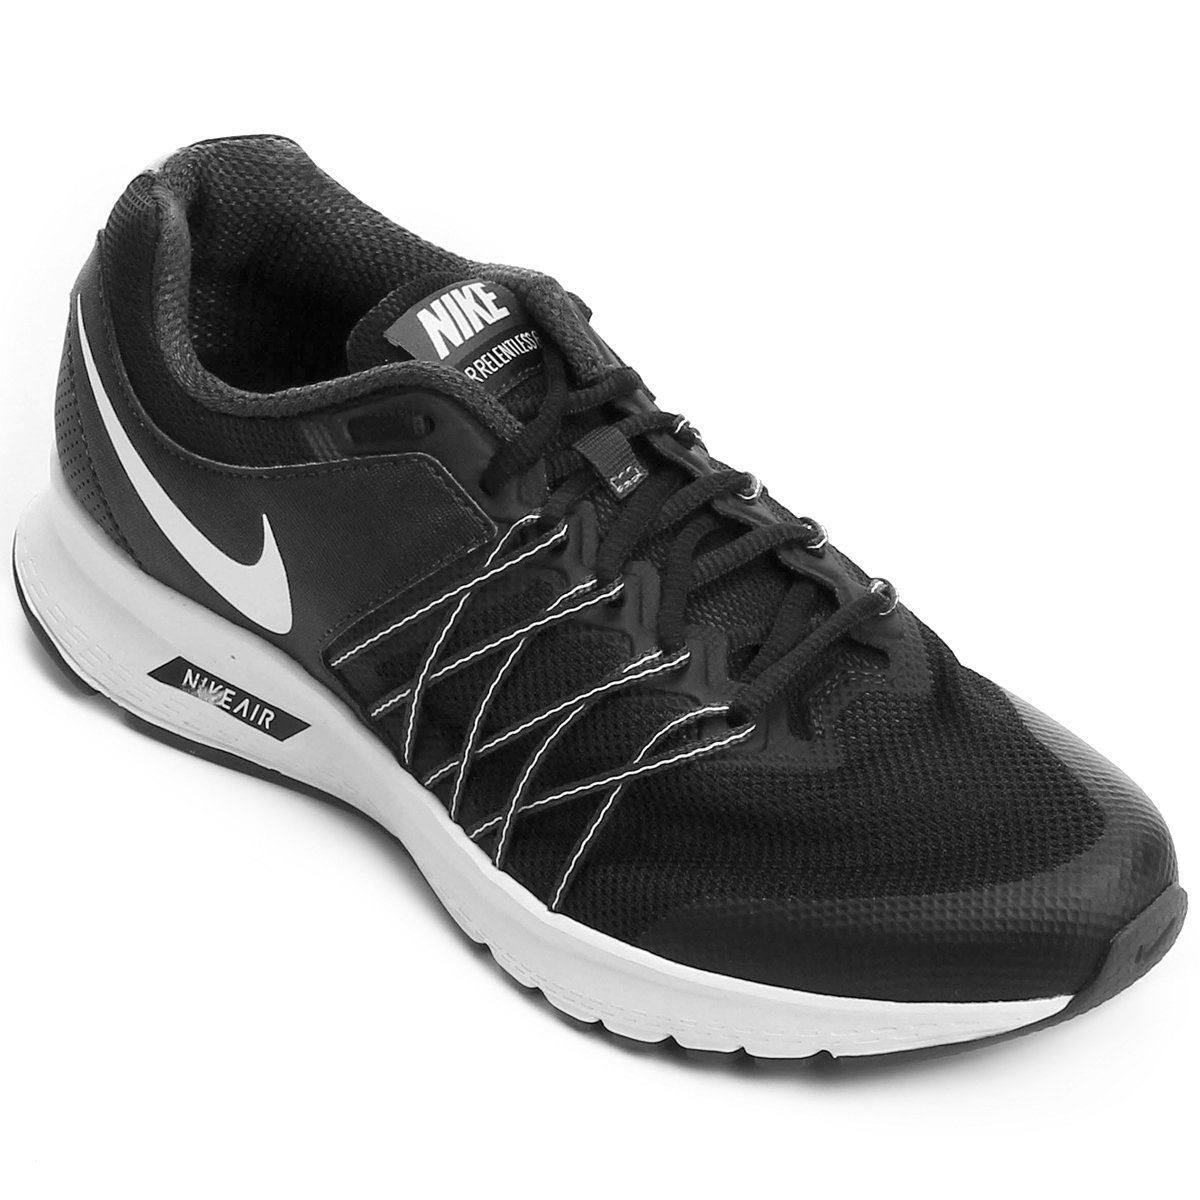 Tênis Nike Air Relentless 6 MSL Feminino - Preto e Branco - Compre ... 099c1be92d504